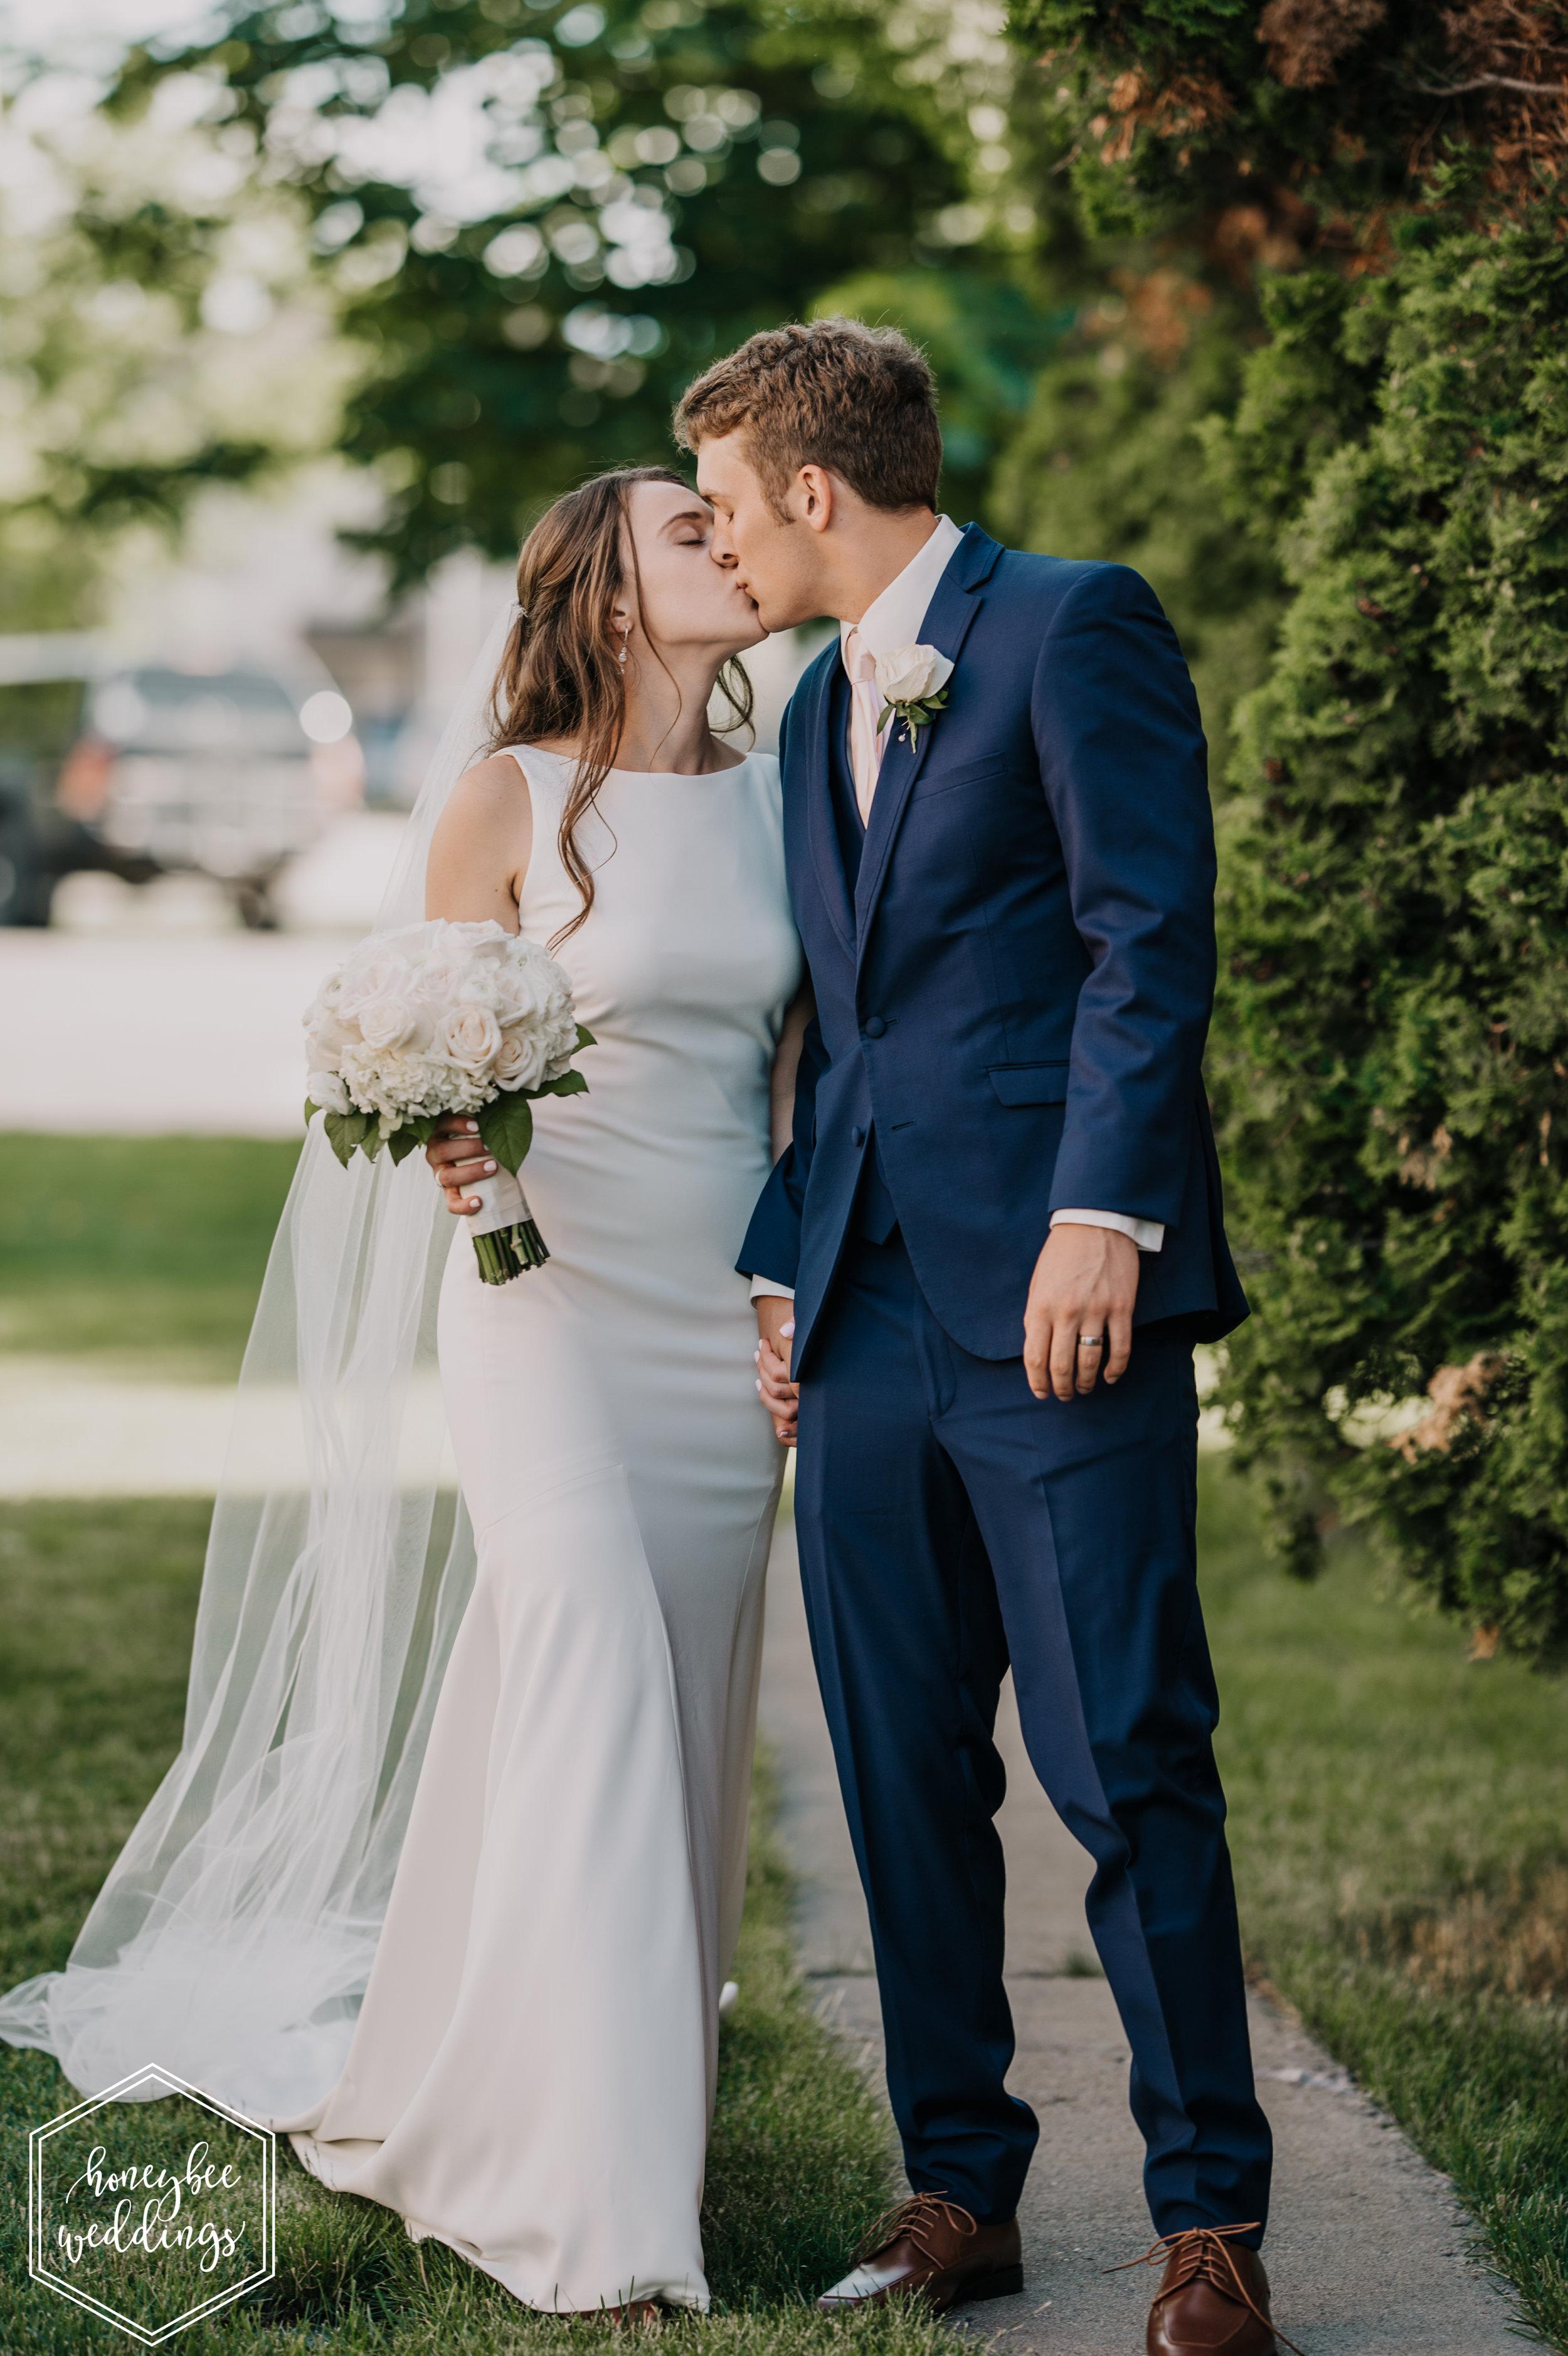 190 Montana Wedding Photographer_St. Francis Wedding_Tifani Zanto + Ryan Burke -5943-2.jpg